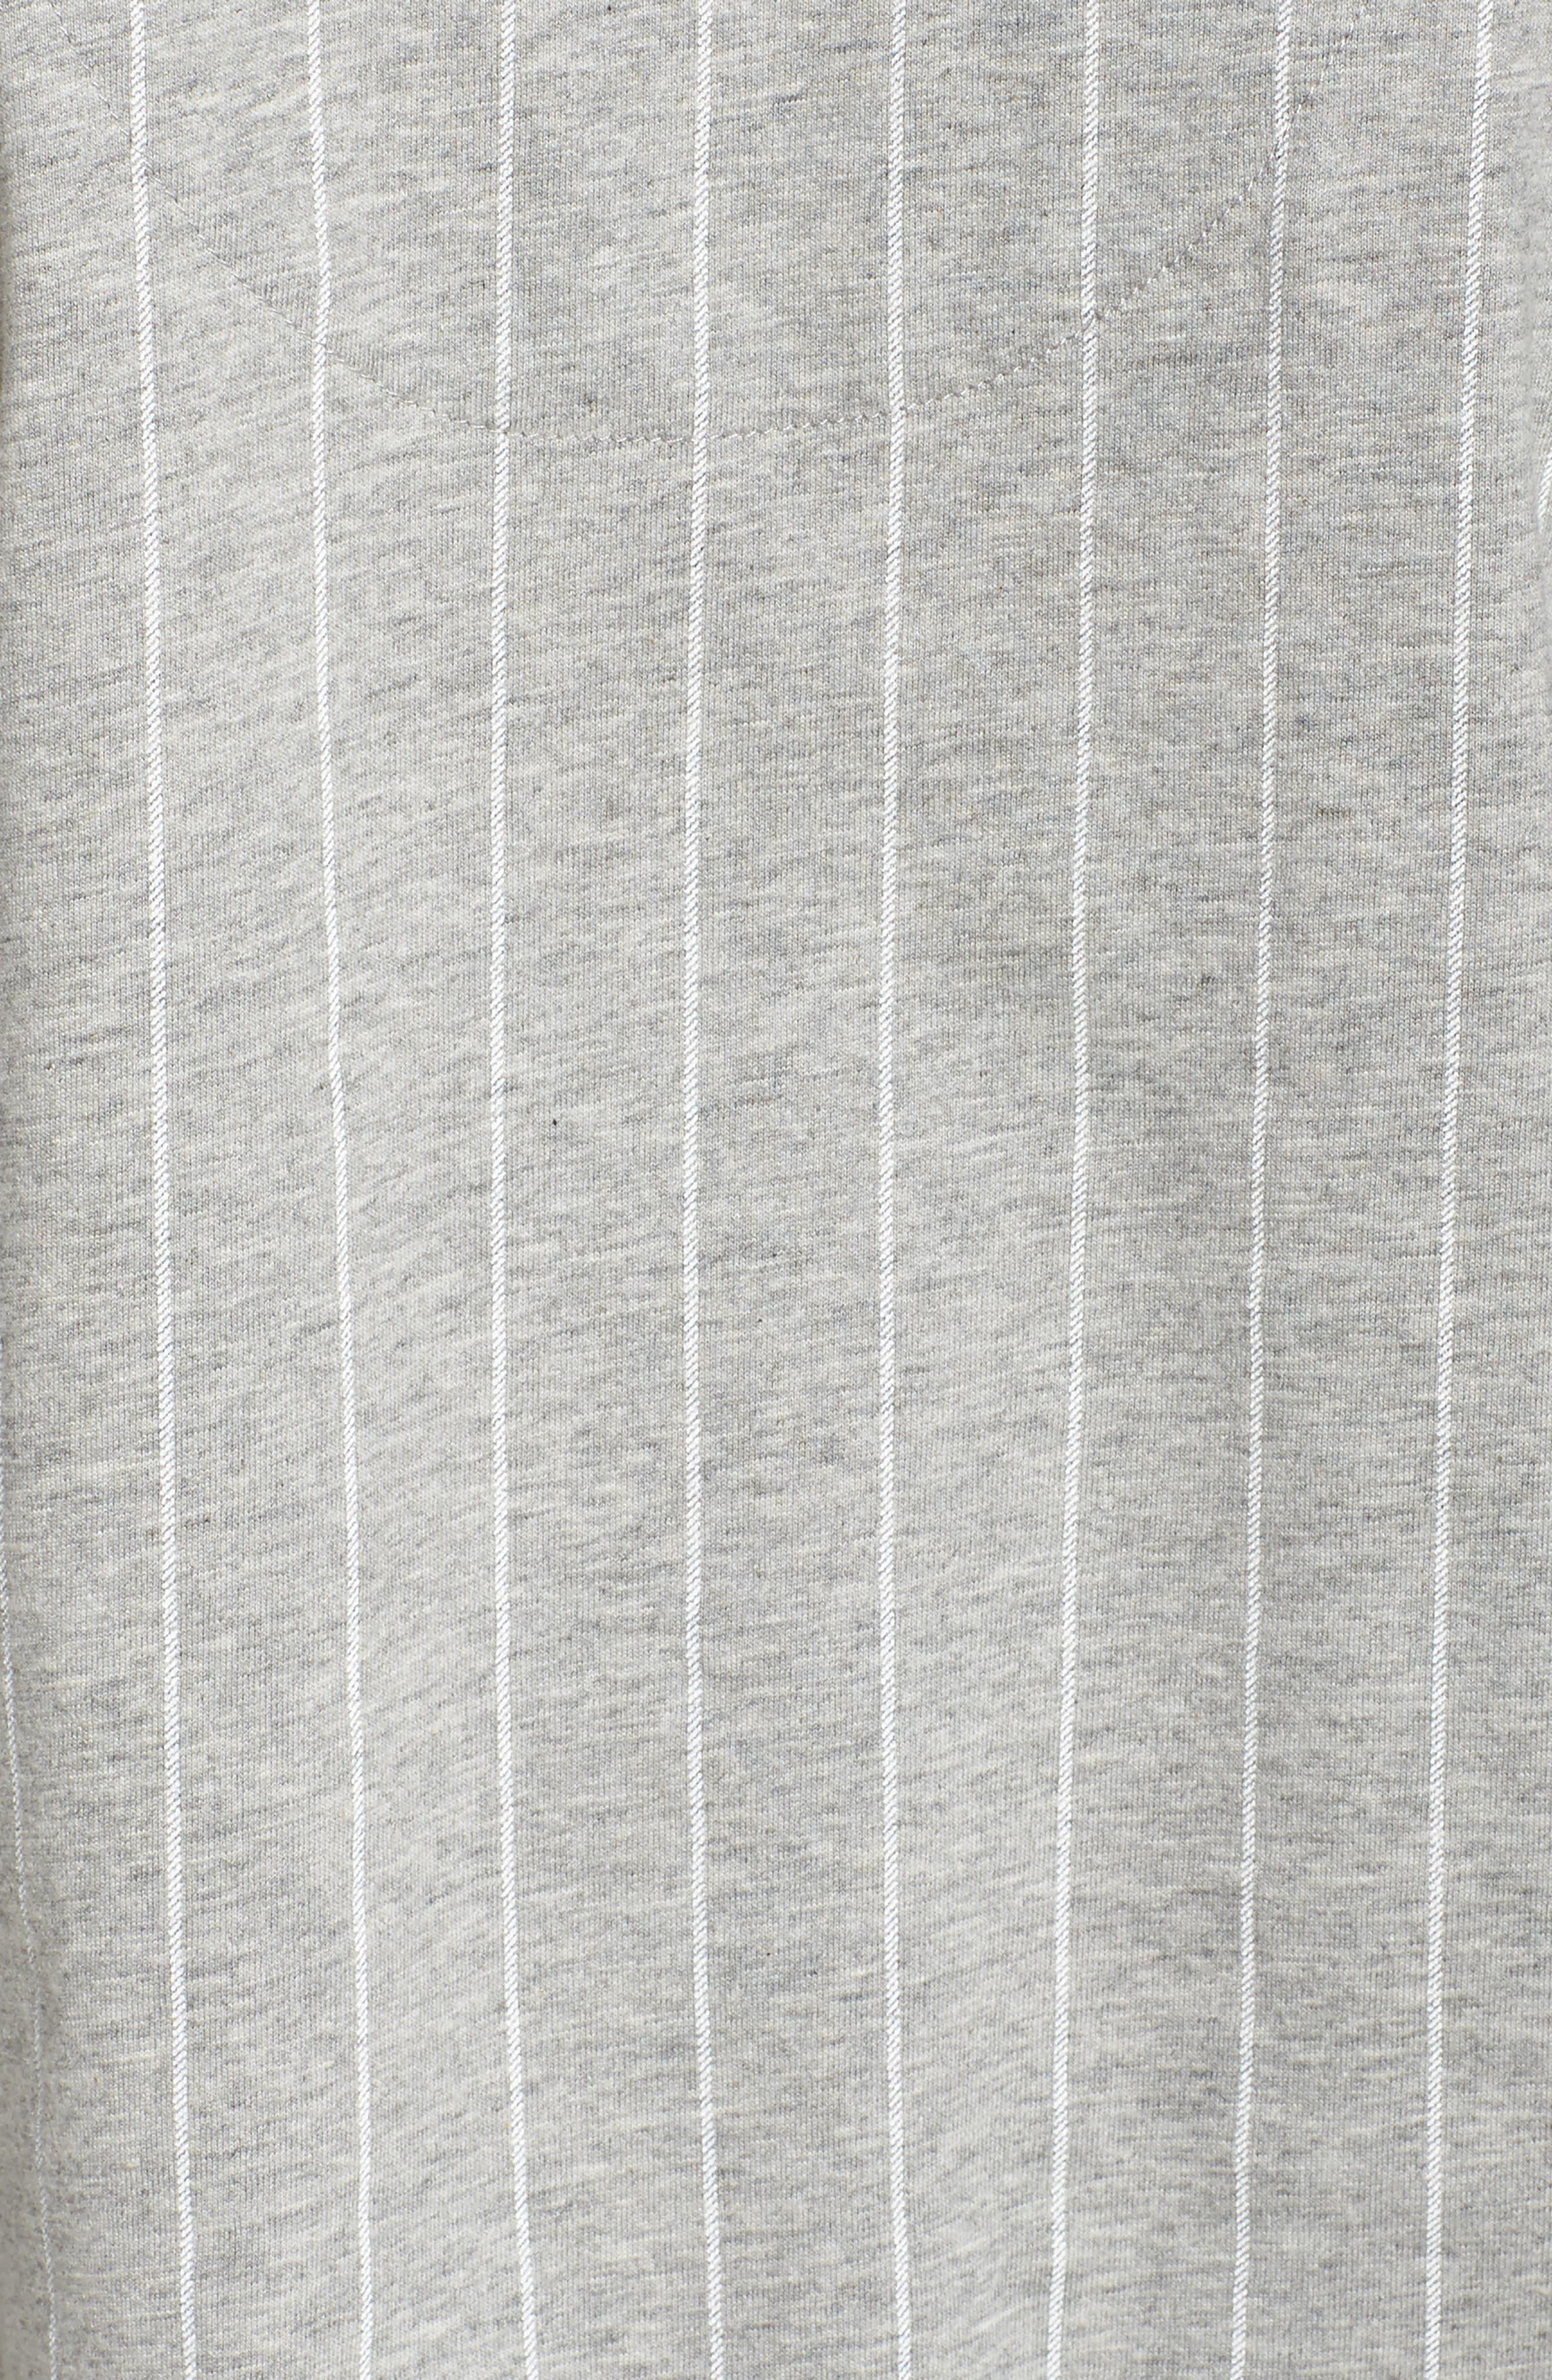 LAUREN RALPH LAUREN, Knit Crop Pajamas, Alternate thumbnail 5, color, GREYSTONE